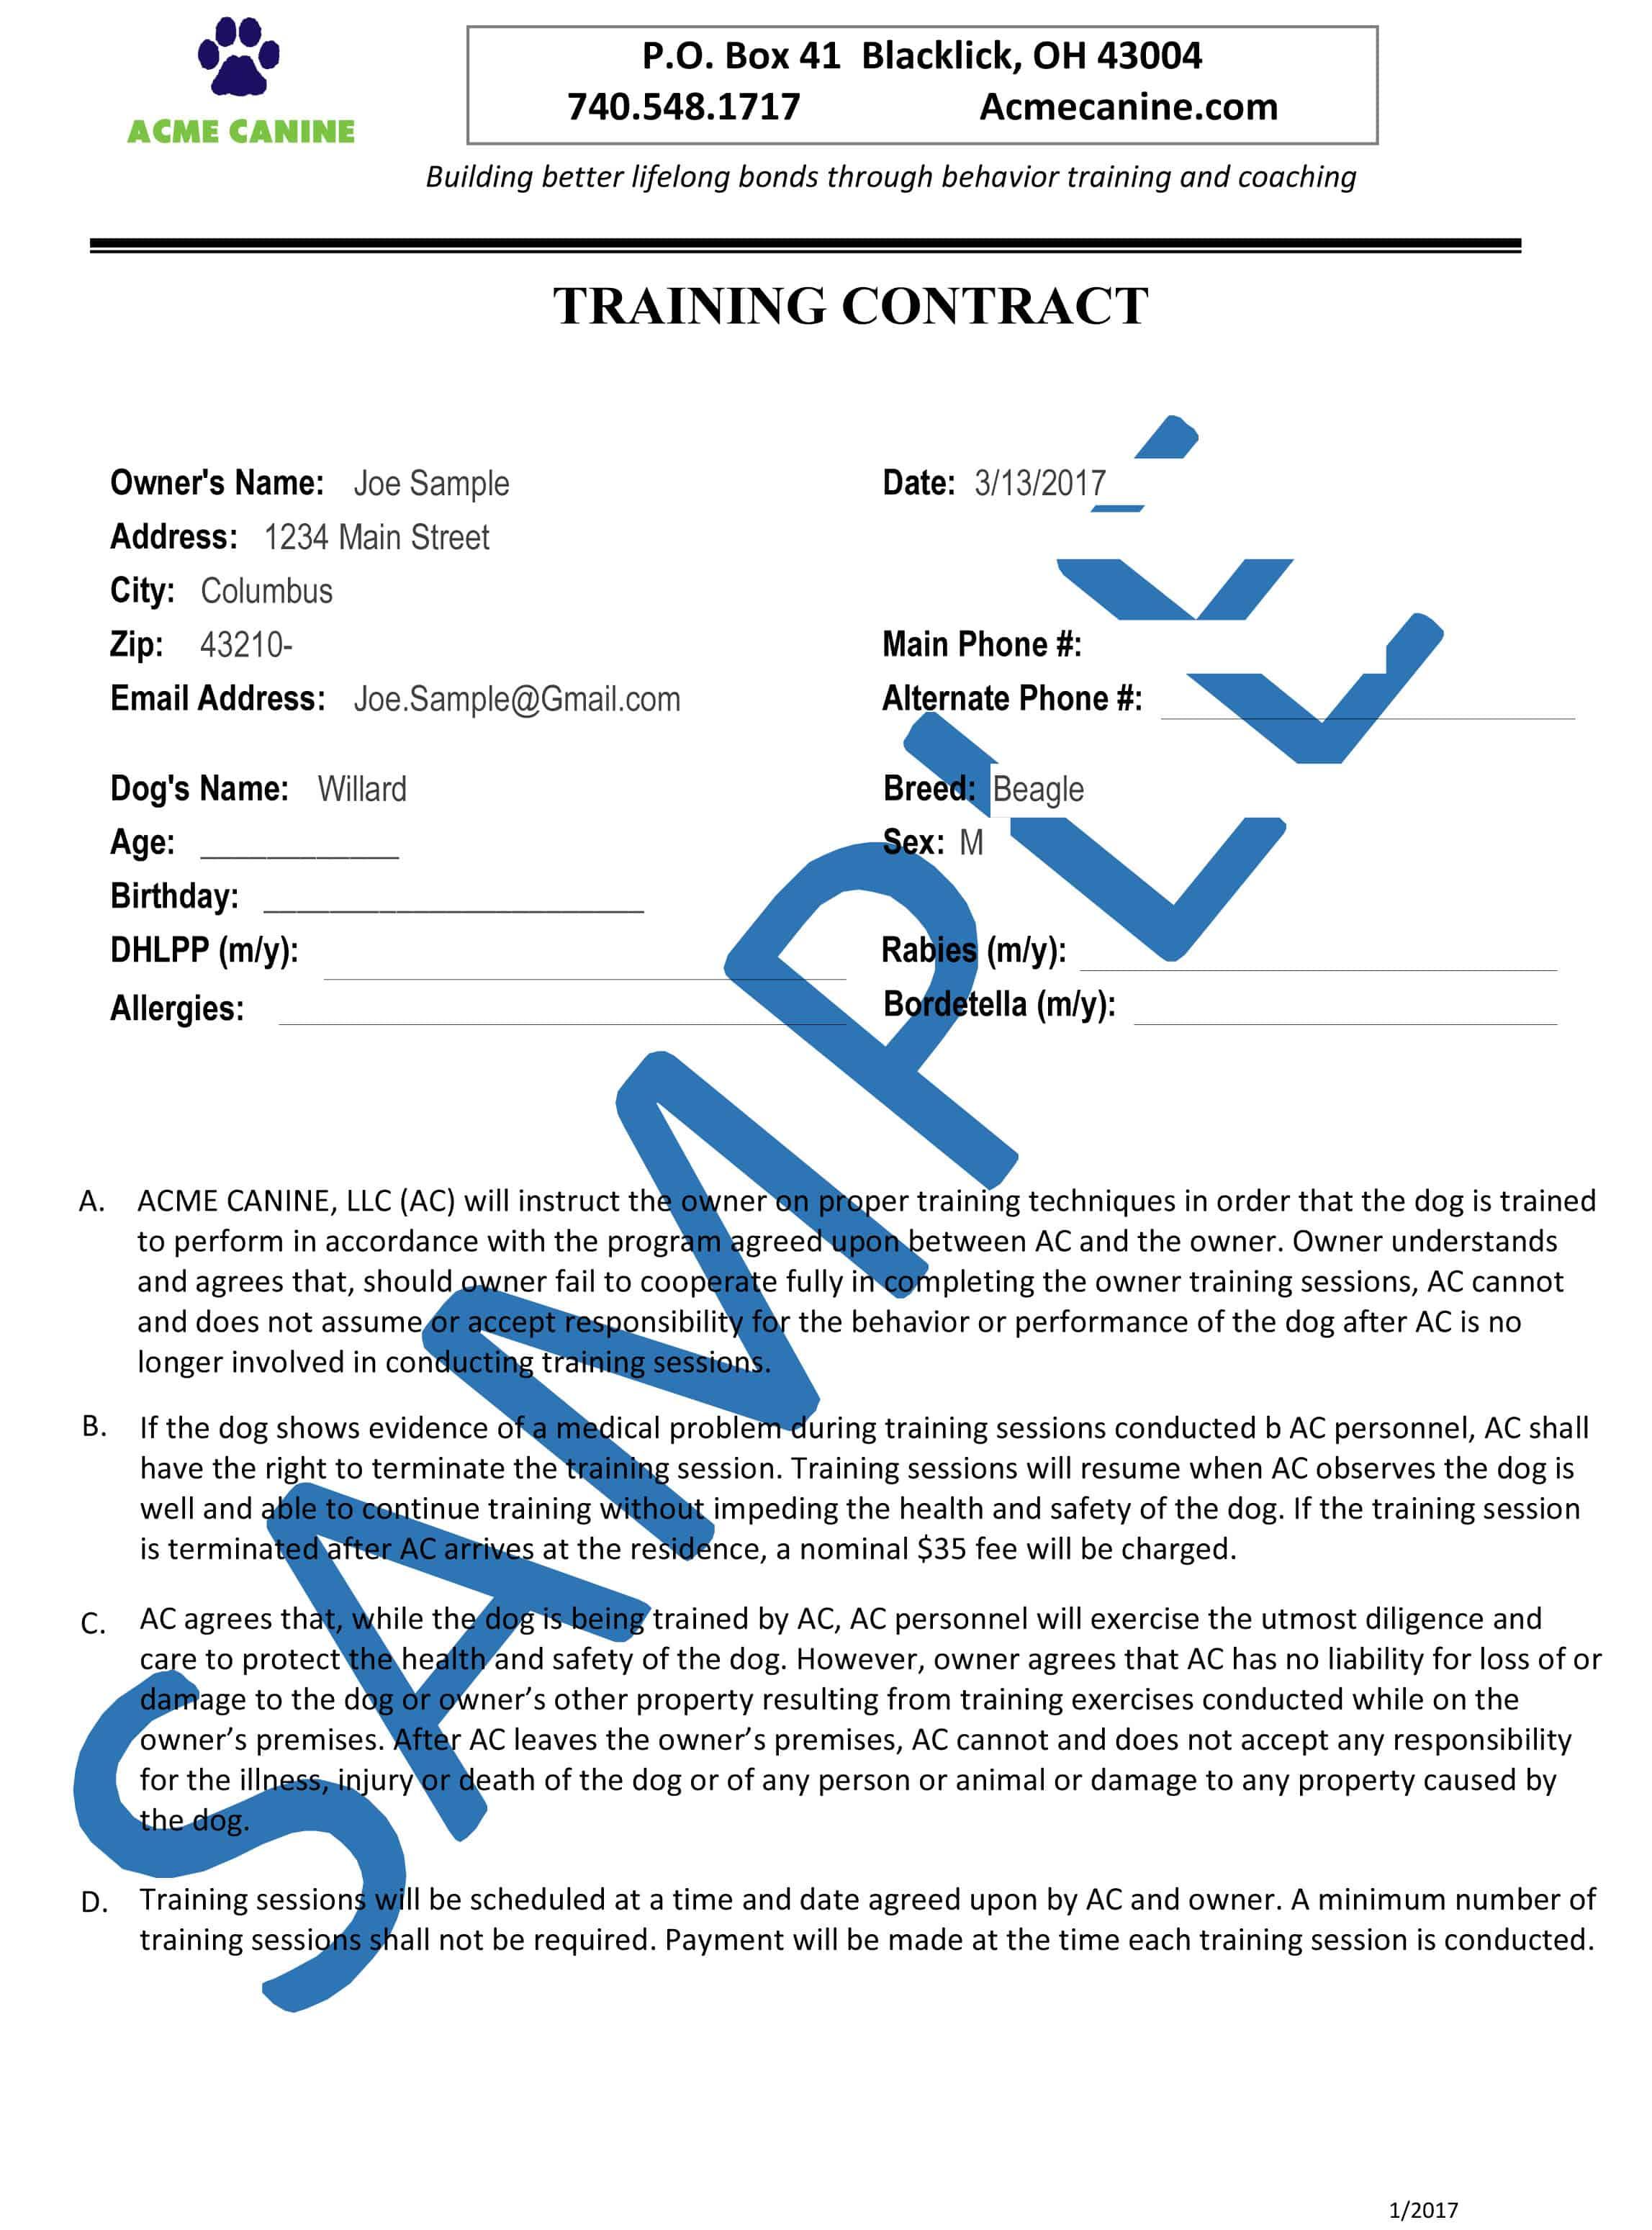 PoliciesAgreements Acme Canine – Training Agreement